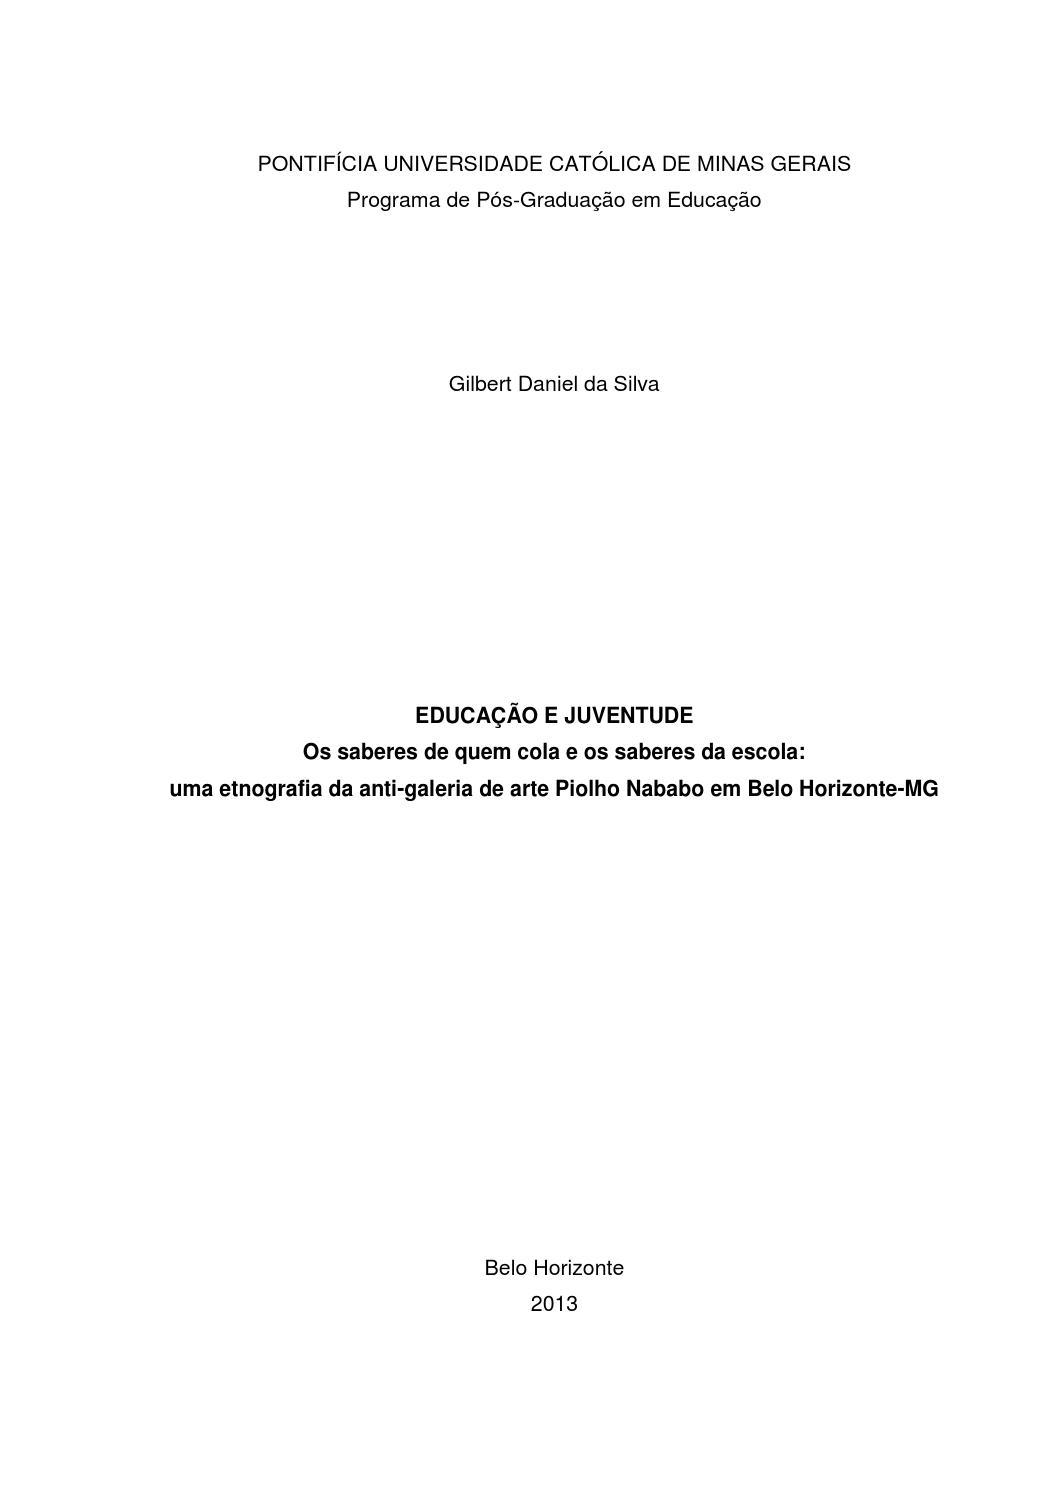 642570f6ffc Lambe-Lambe  etnografia da anti-galeria de arte do Piolho Nababo em Belo  Horizonte-MG by Gilbert Daniel - issuu